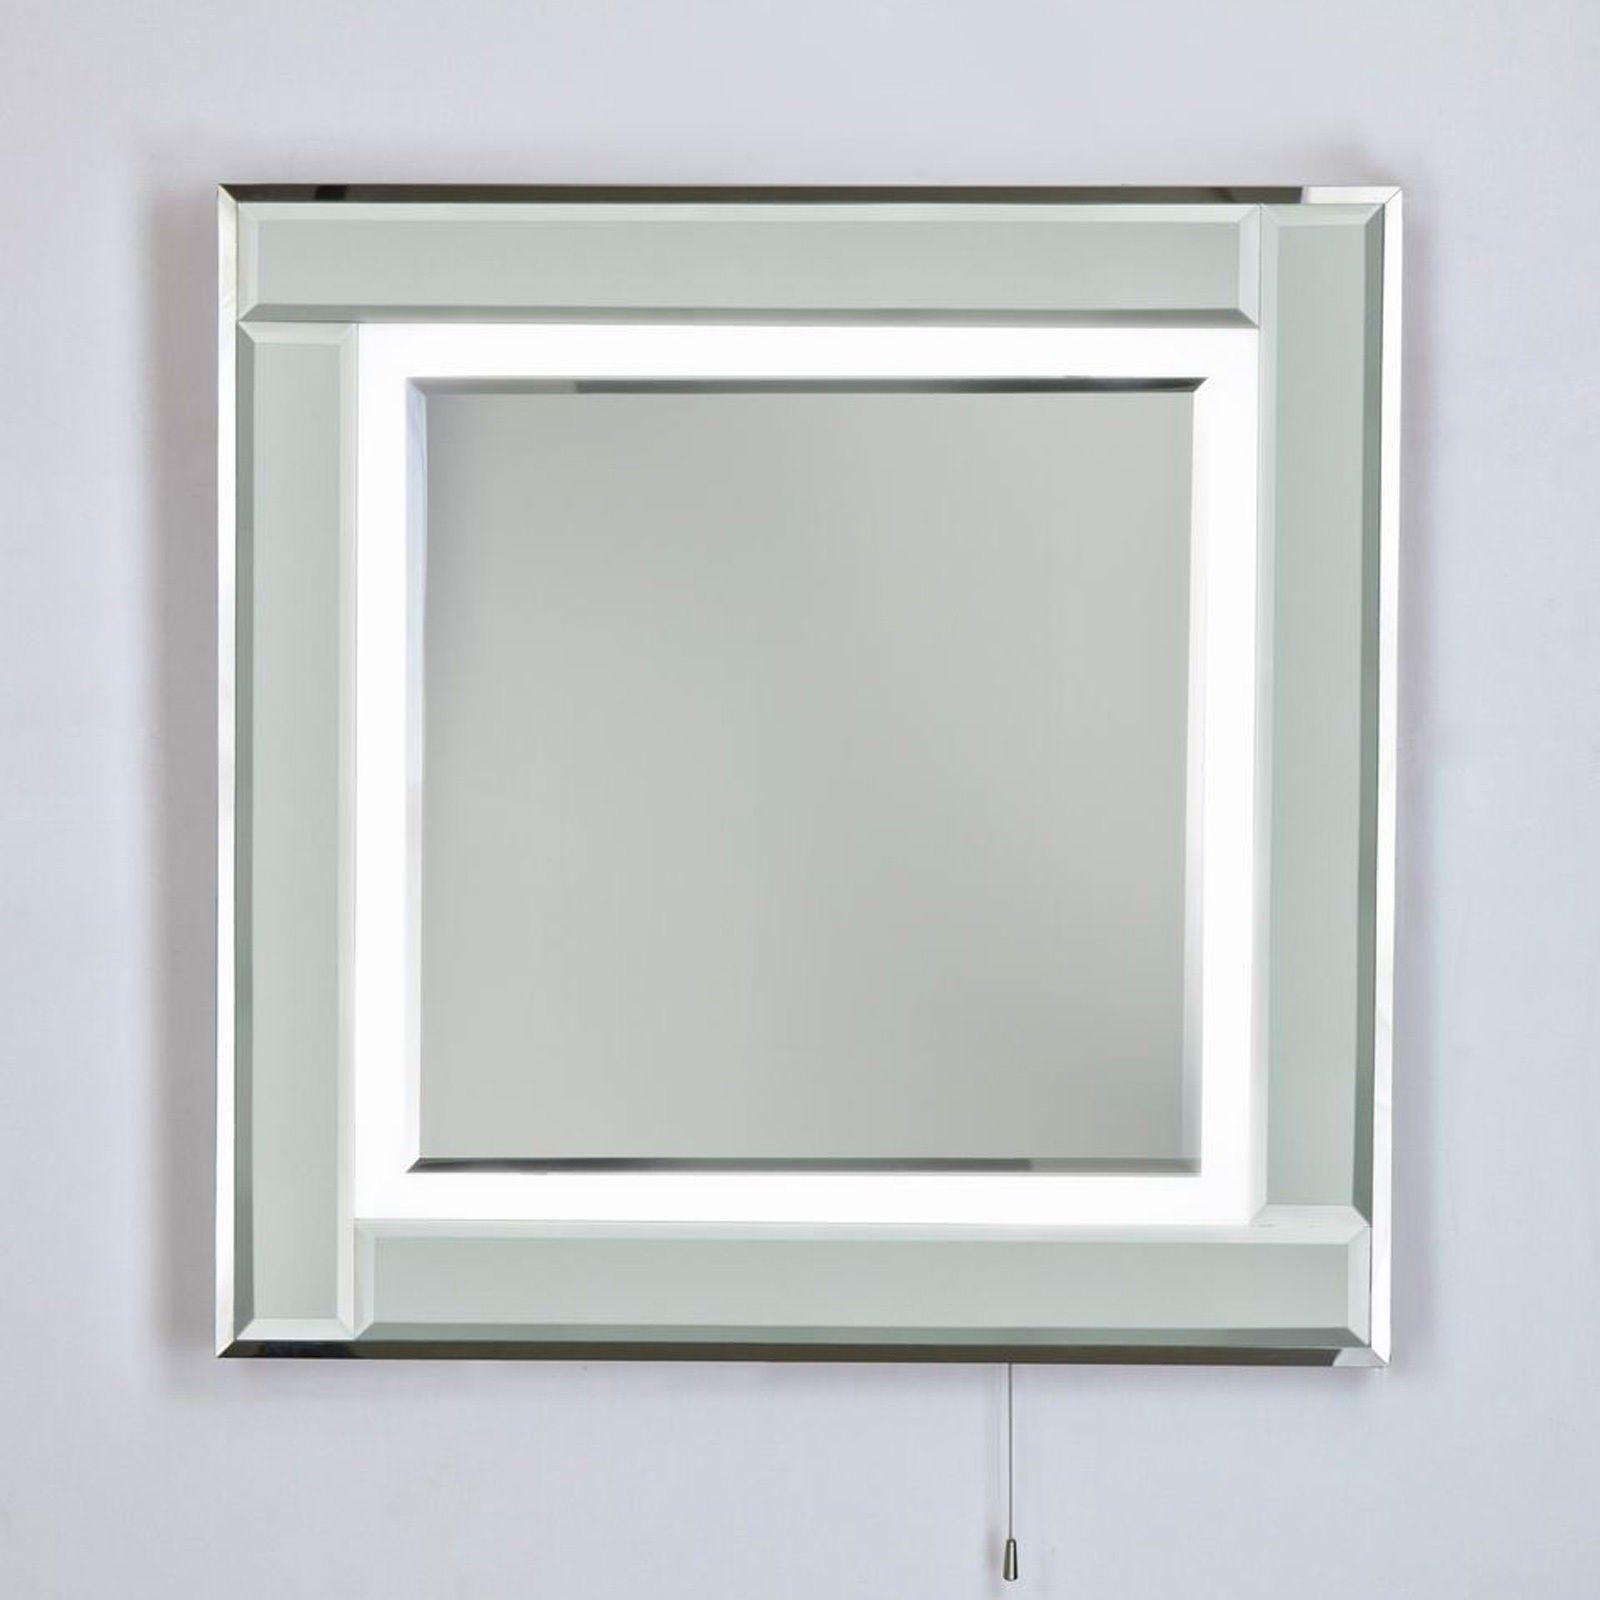 Lavio Illuminated Mirror - Clearance   Stainless Steel Bathroom ...